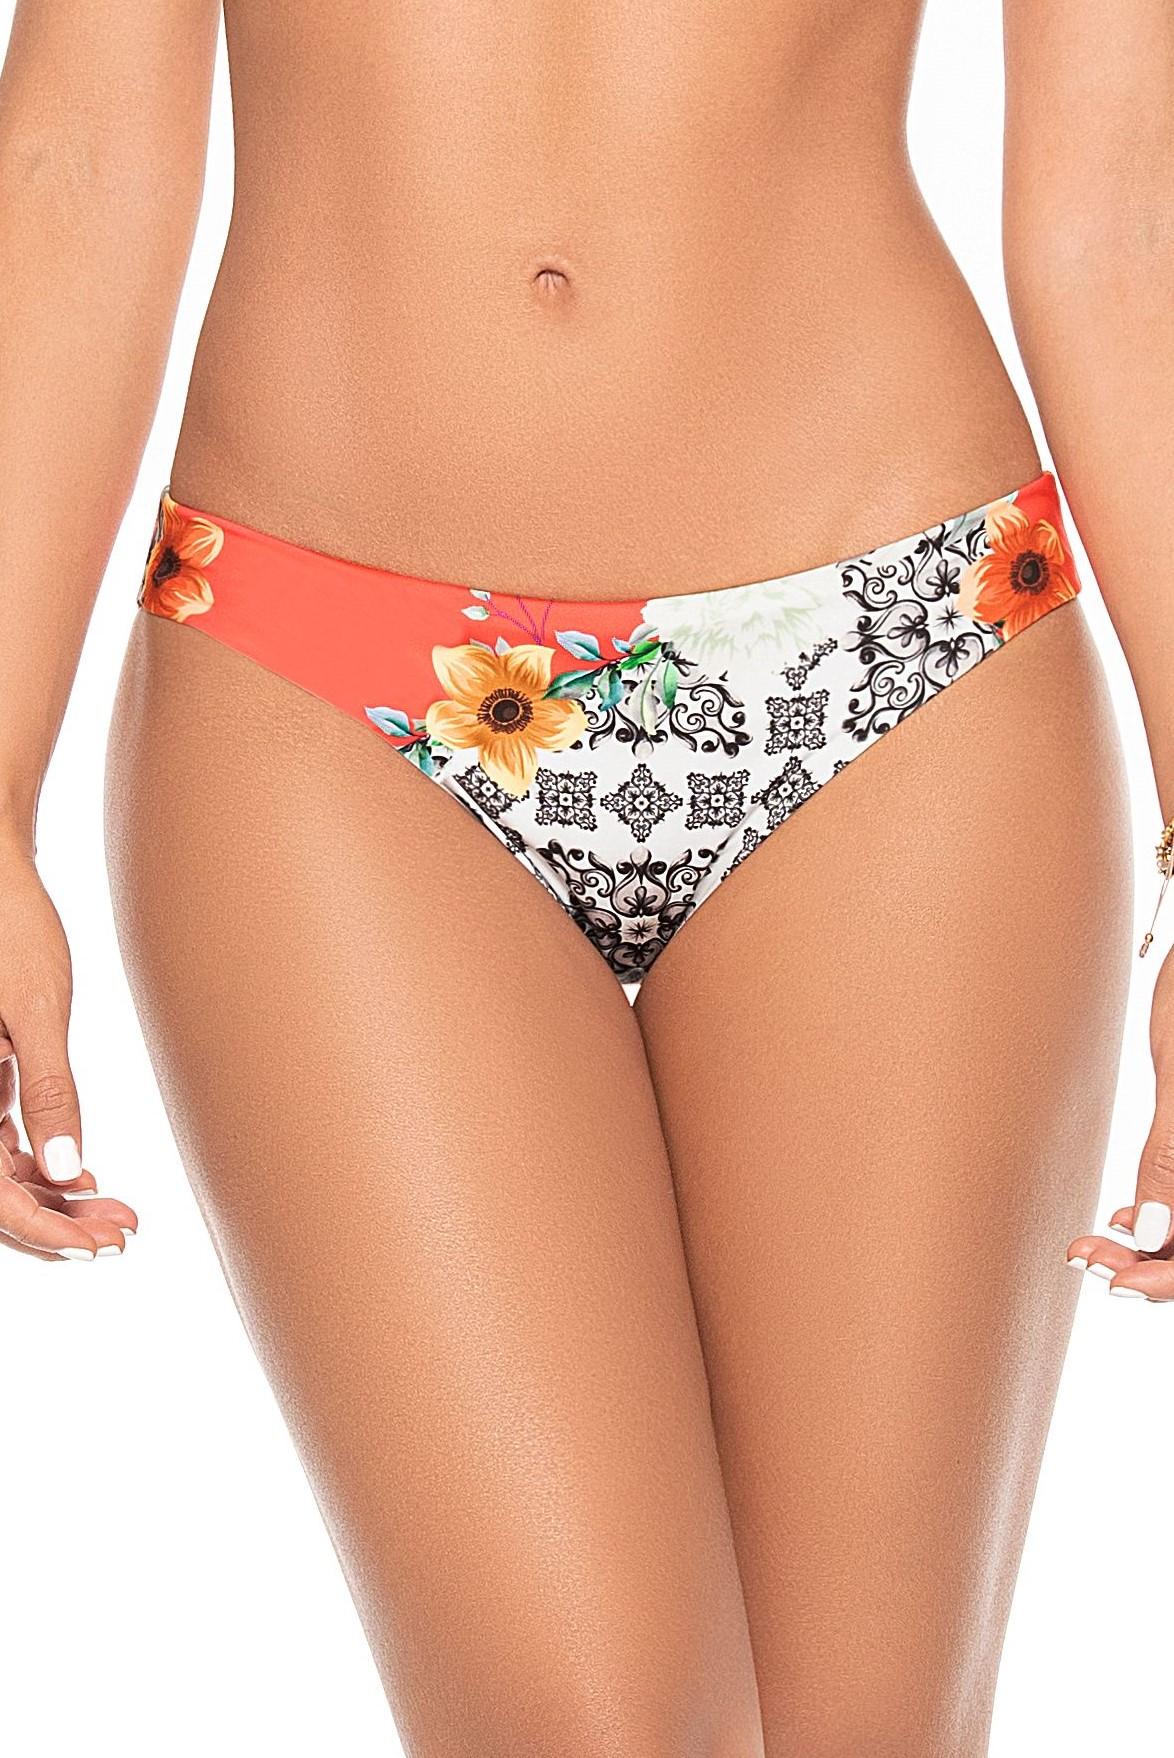 Phax Bella Austria Scrunch Bikini Bottom